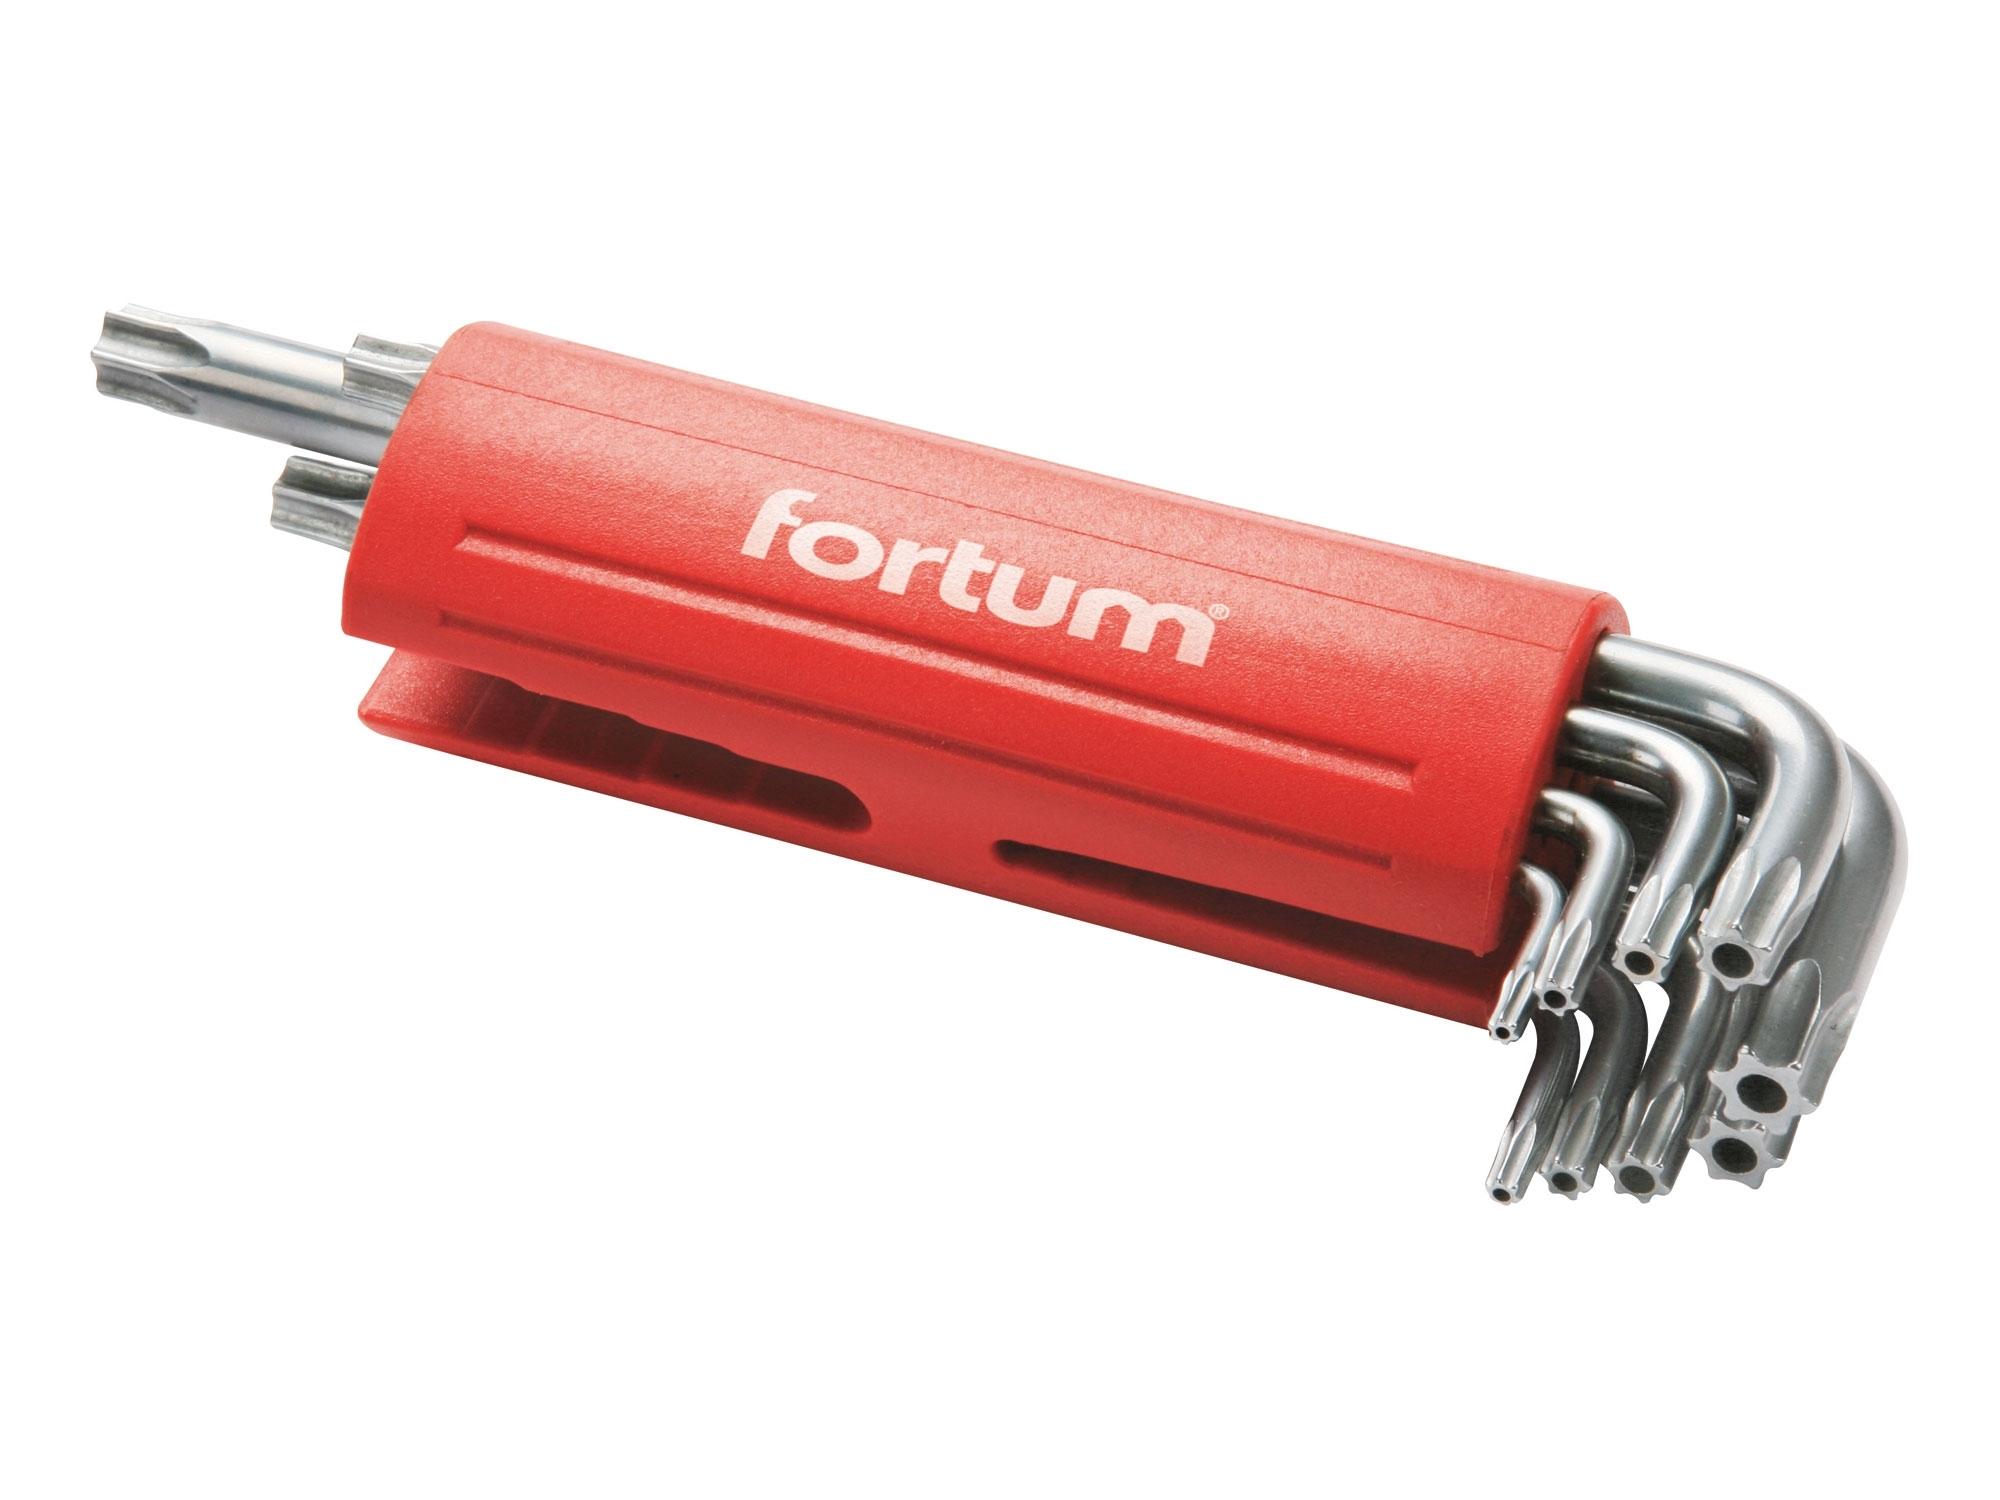 L-klíče TORX vrtané, sada 9ks, 10-50mm